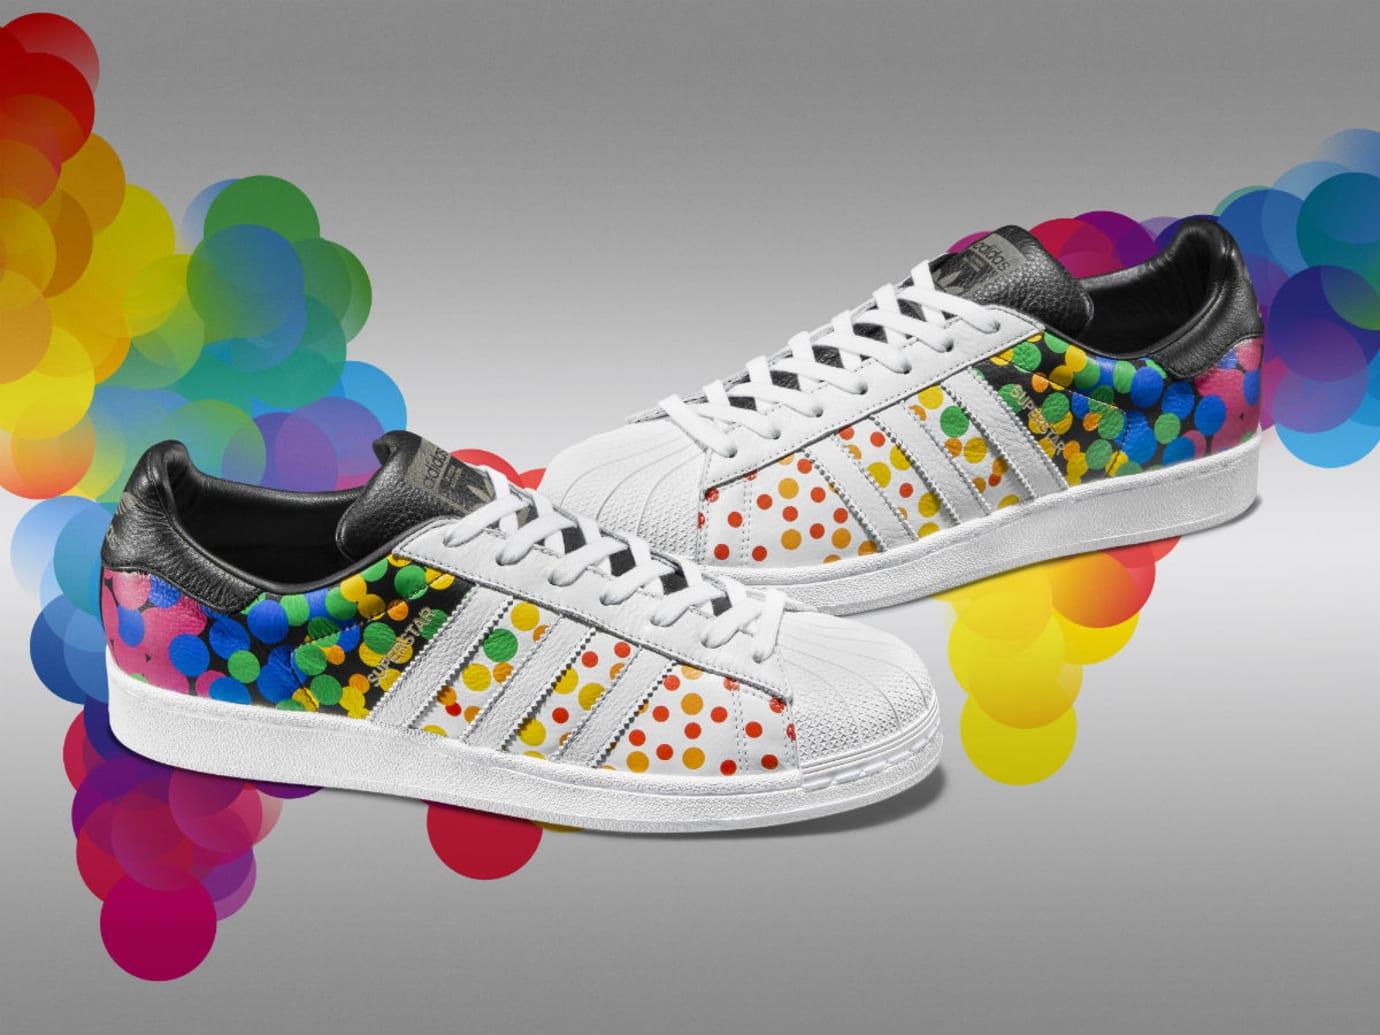 Adidas Pride Pack Superstar Release Date